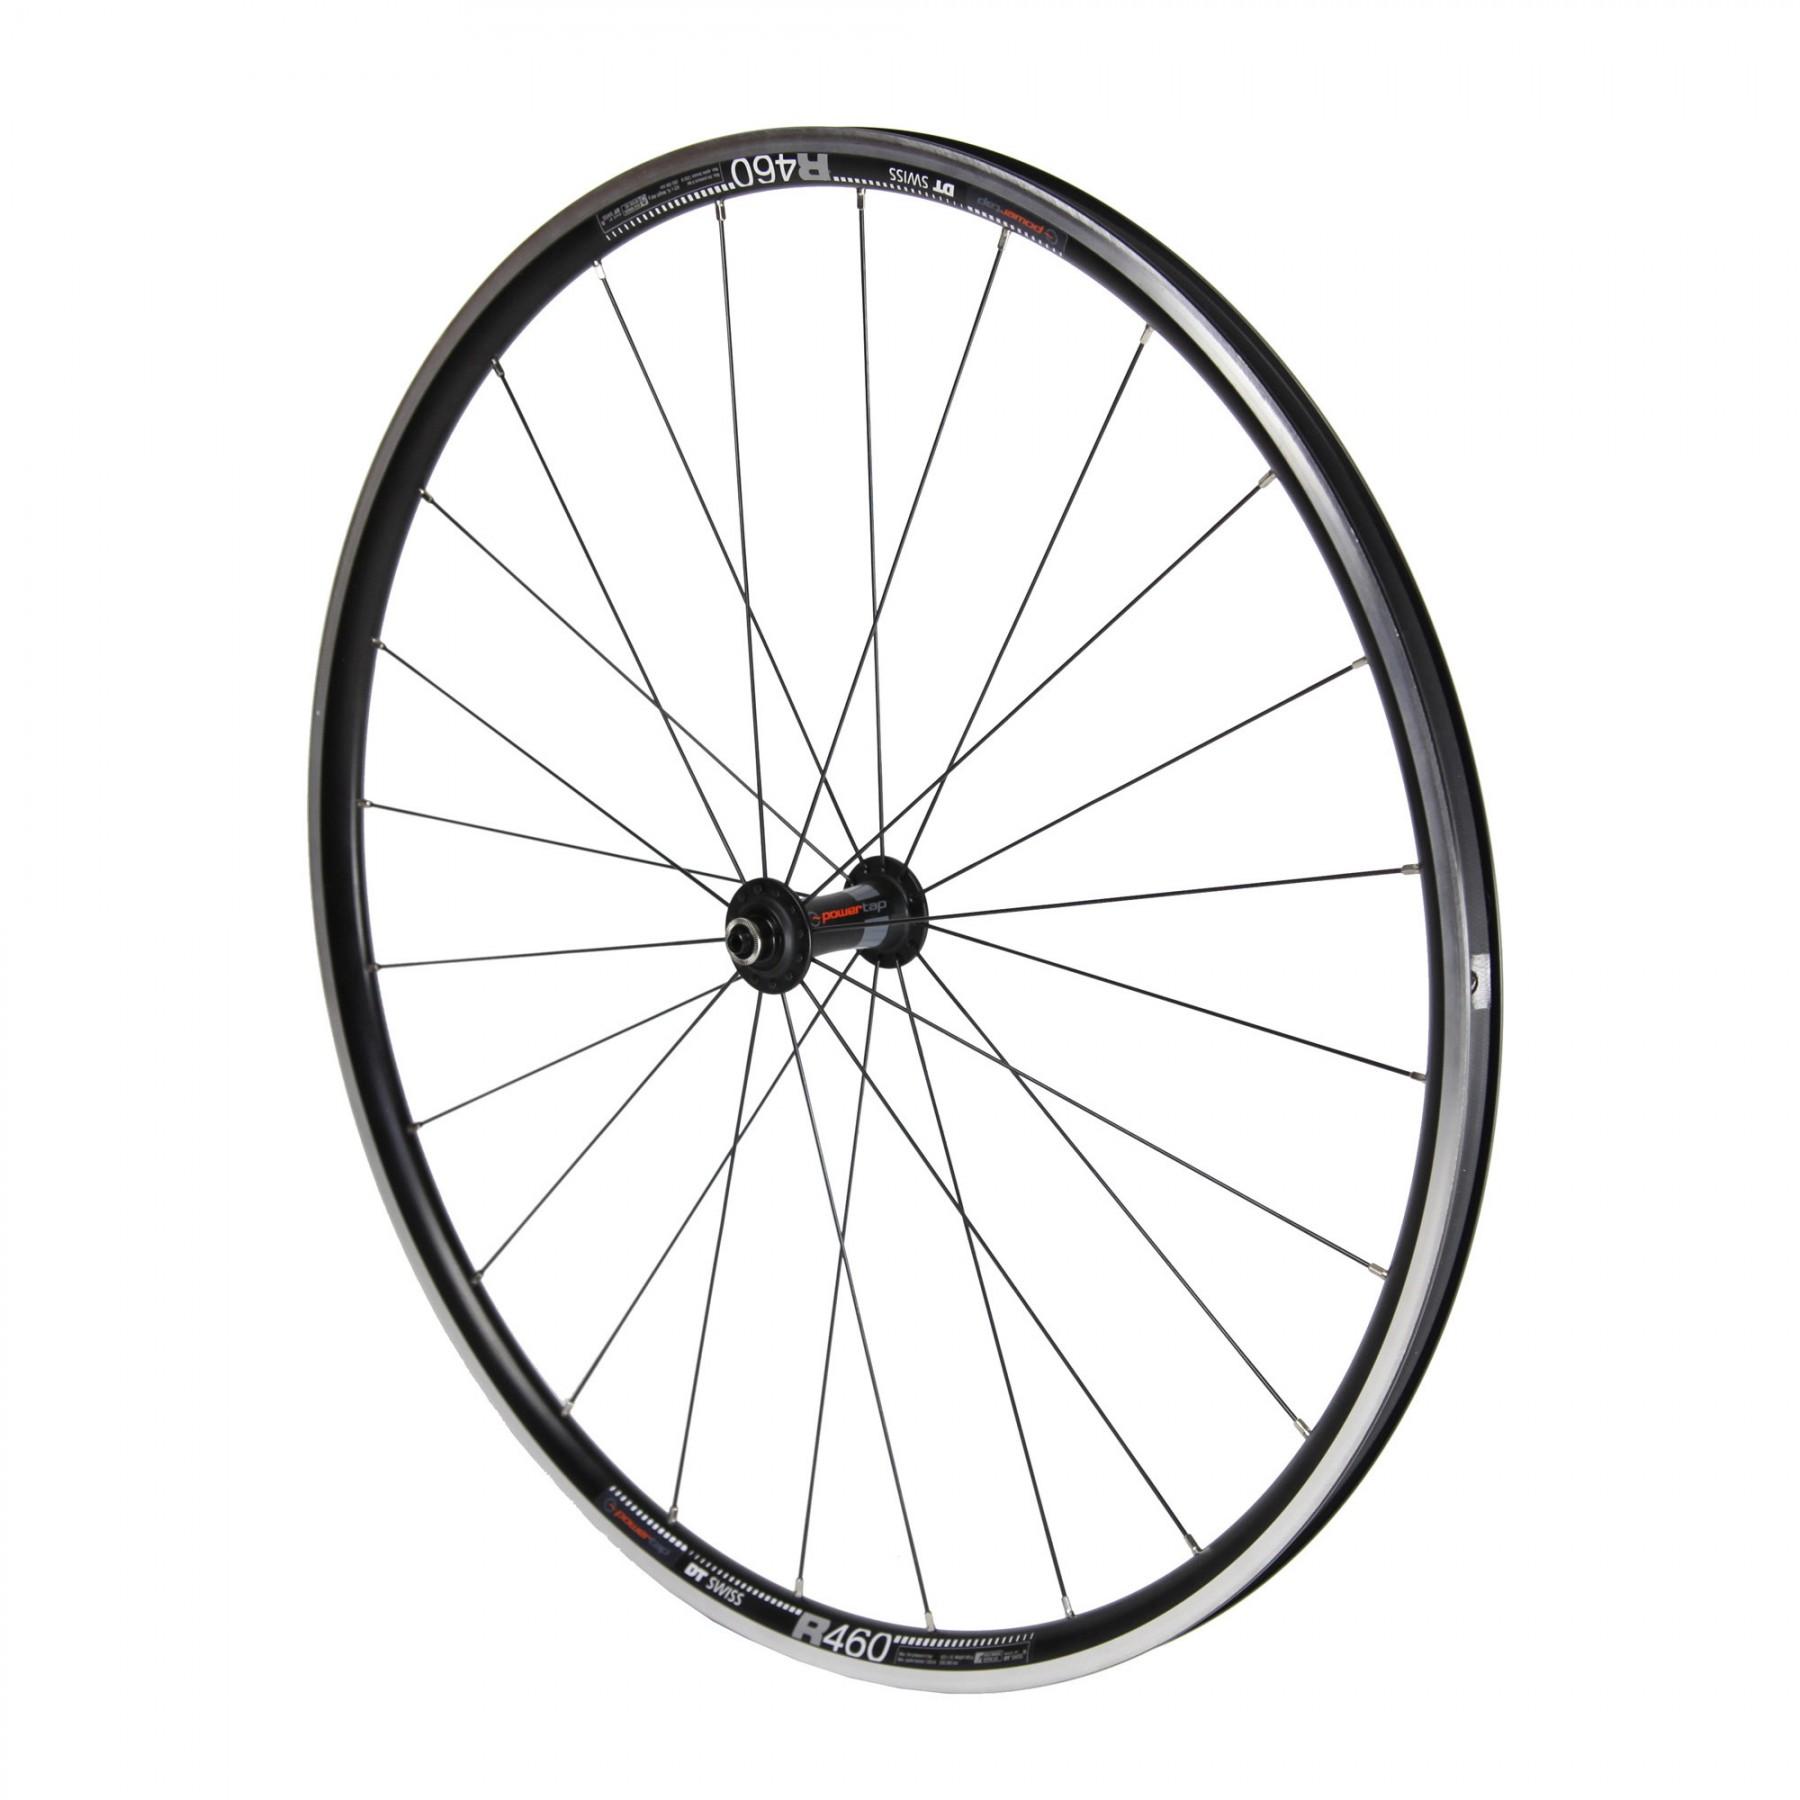 Dt Swiss R460 Alloy Front Wheel 24h